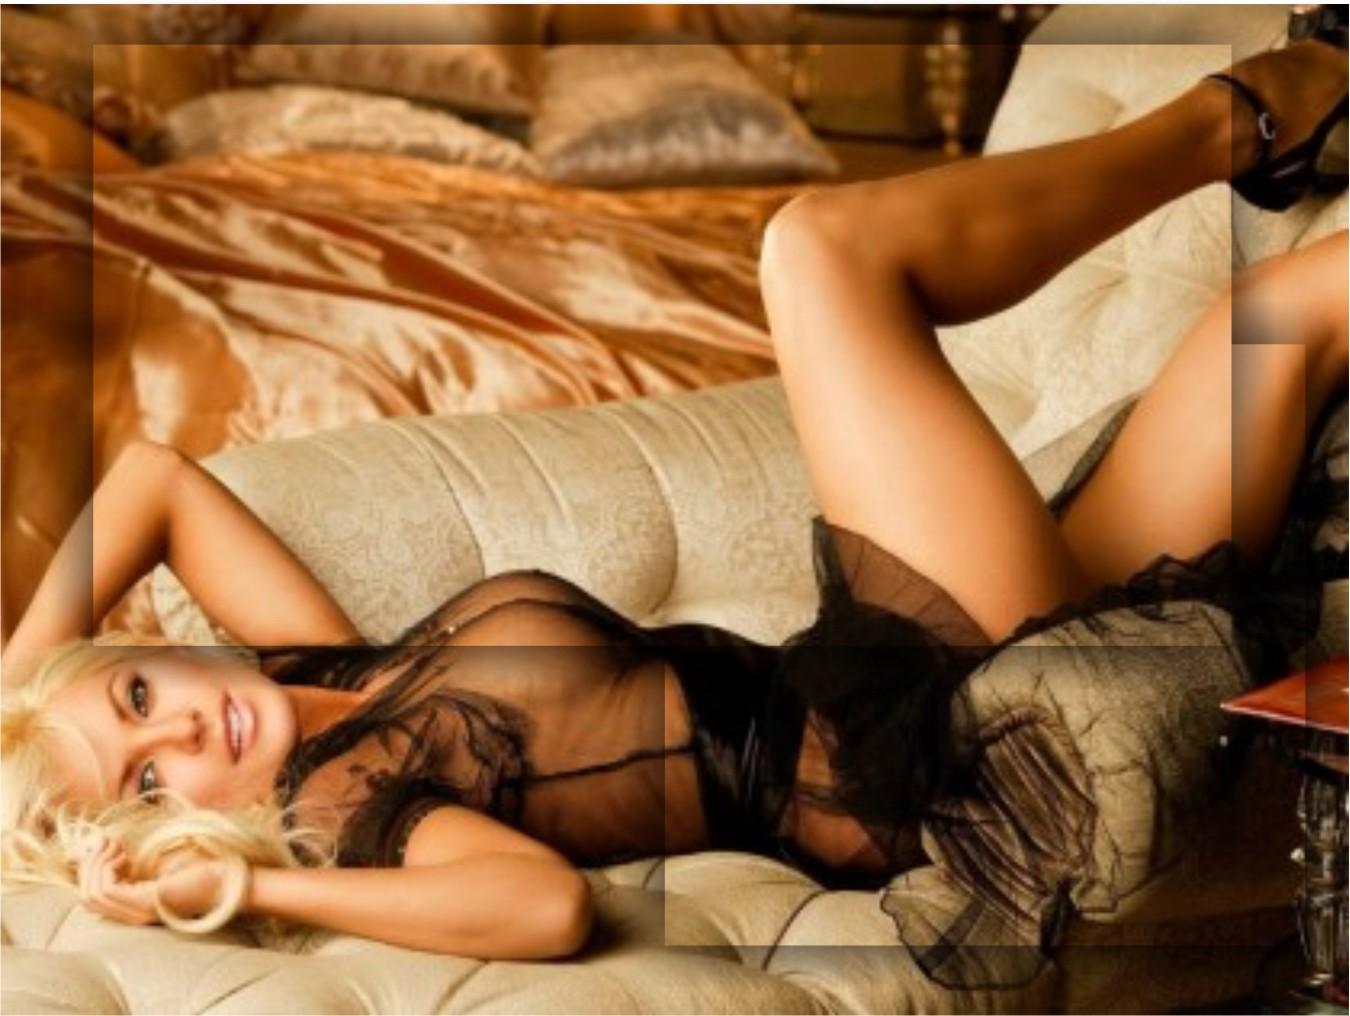 http://3.bp.blogspot.com/-OP5dkRUgte4/TjbOy0oK0JI/AAAAAAAAAb8/wTx27hgFDT4/s1600/Crystal+Harris+Sexy+Wallpaper%252C+hot+Photo%252C+Images+and+Picture+Download+2.jpg